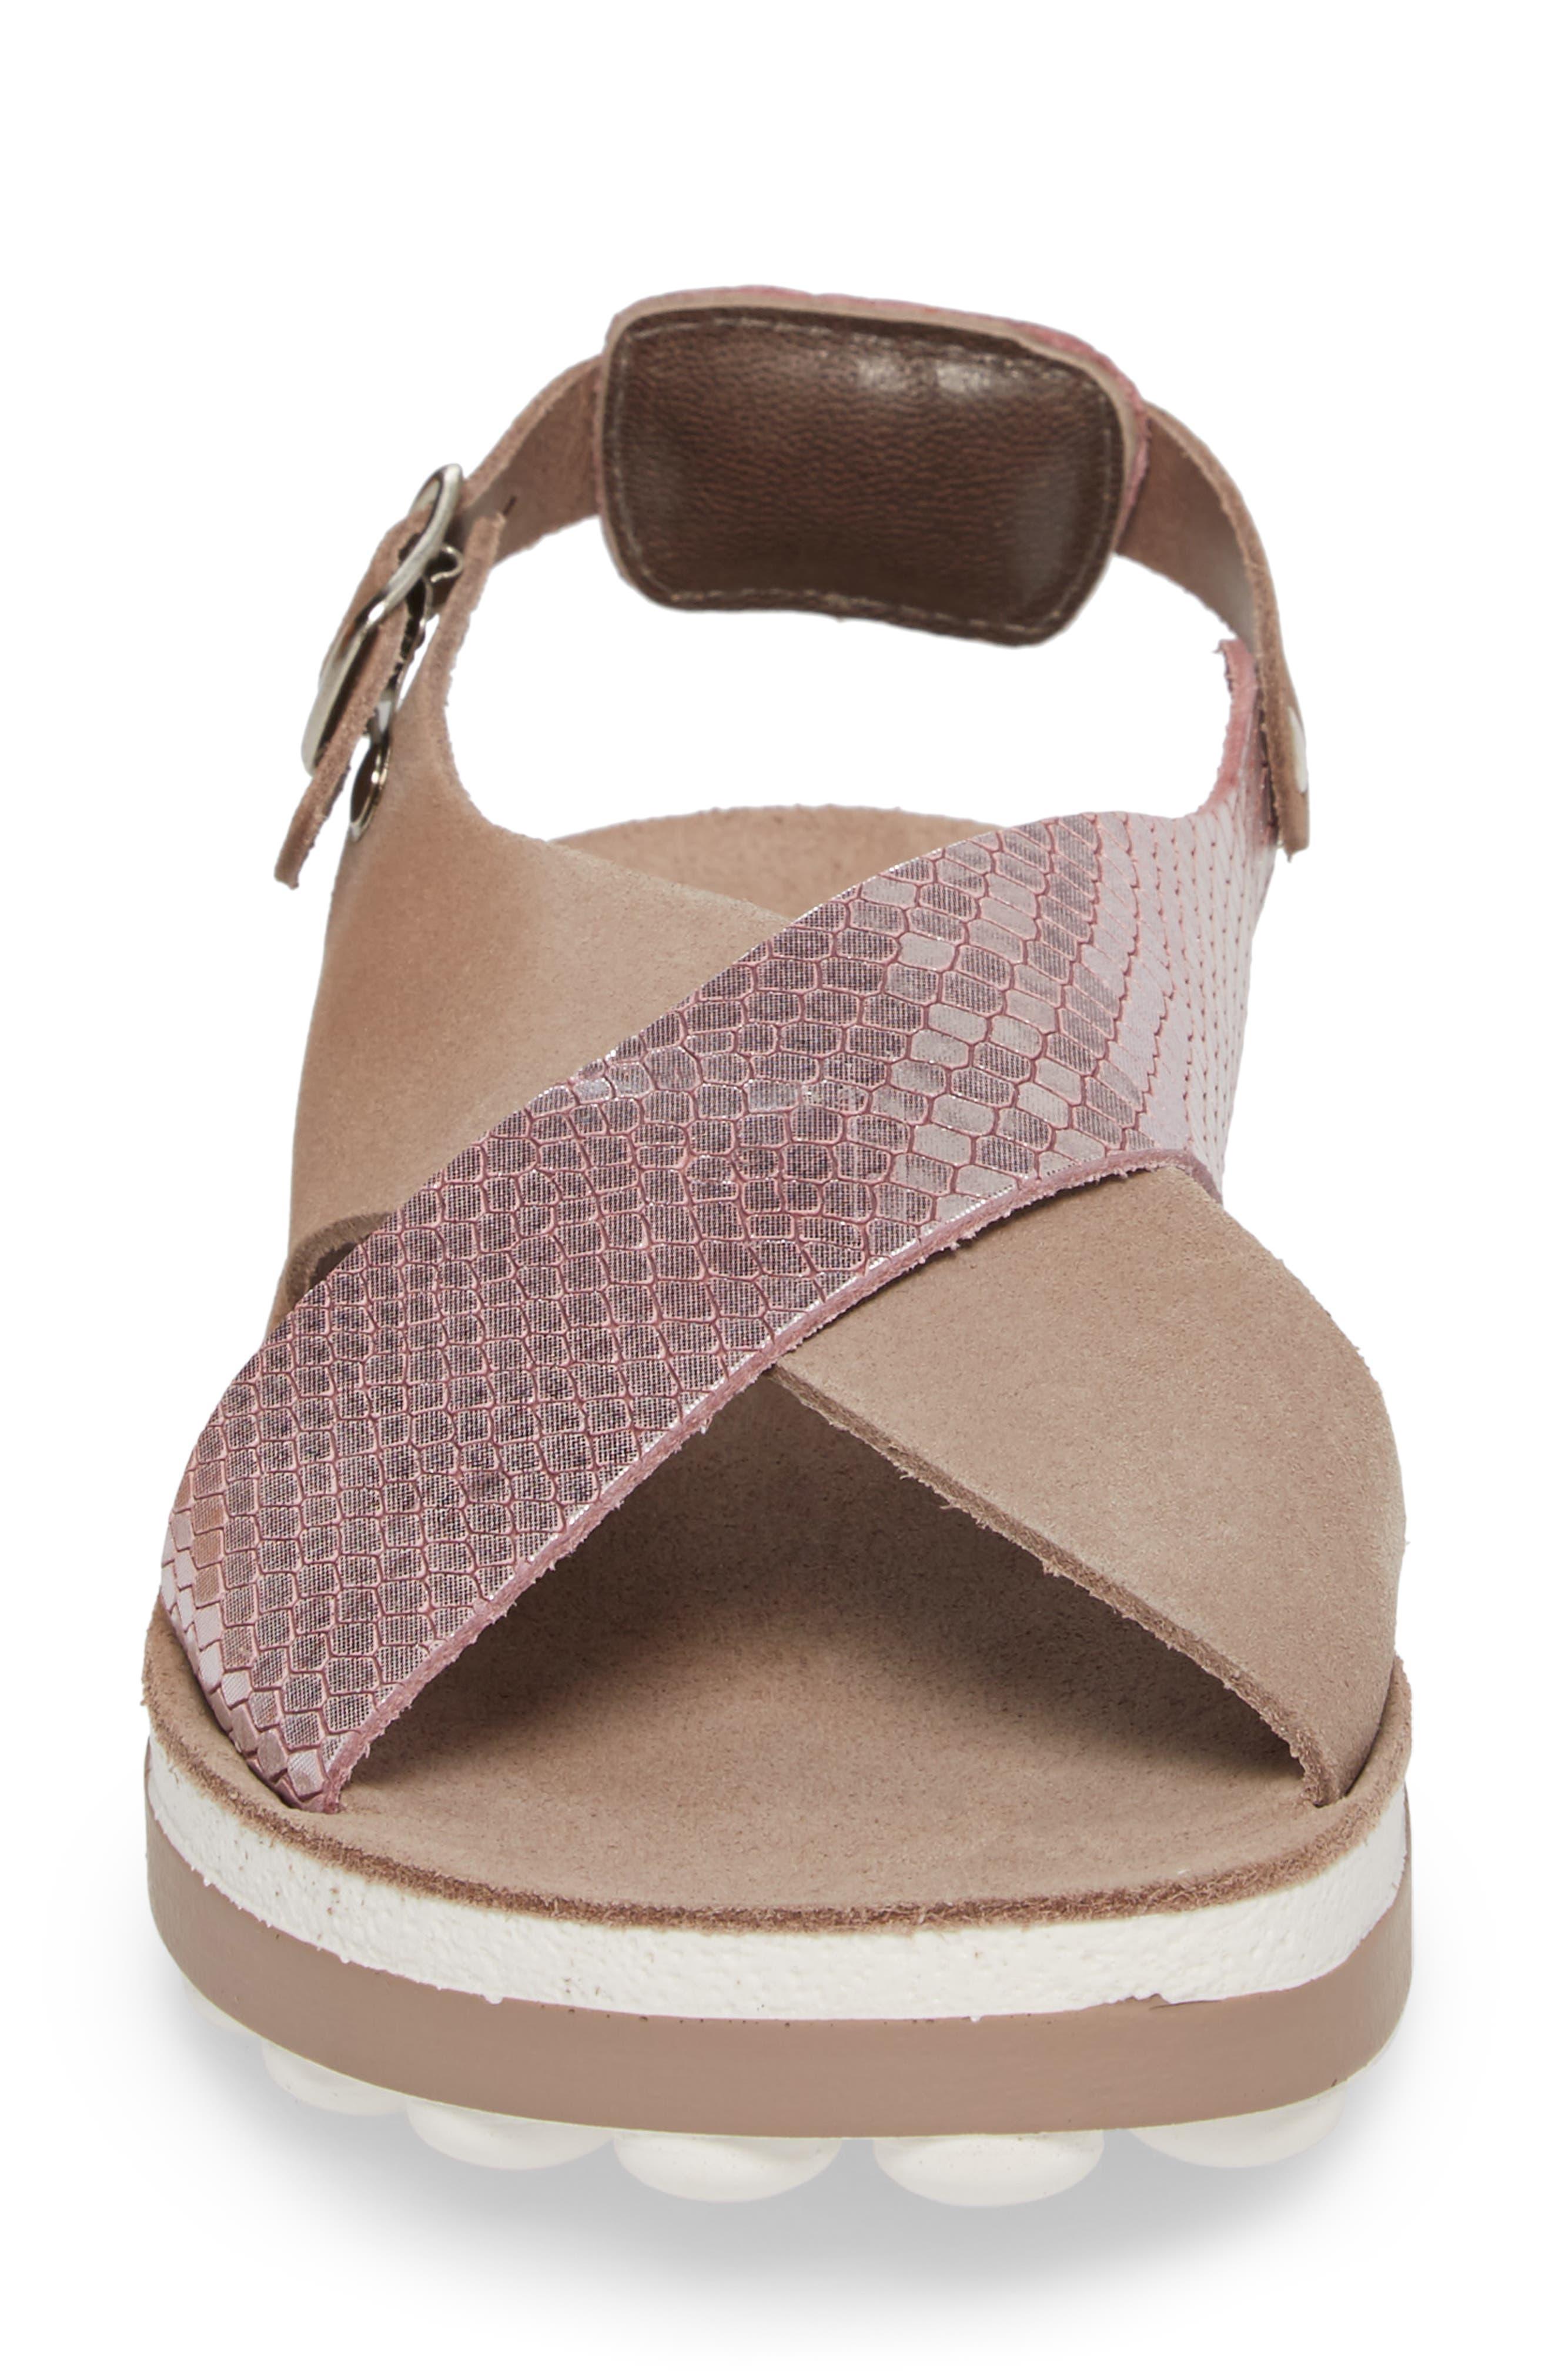 Izabella Fantasy Platform Sandal,                             Alternate thumbnail 4, color,                             Coffee Snake Leather